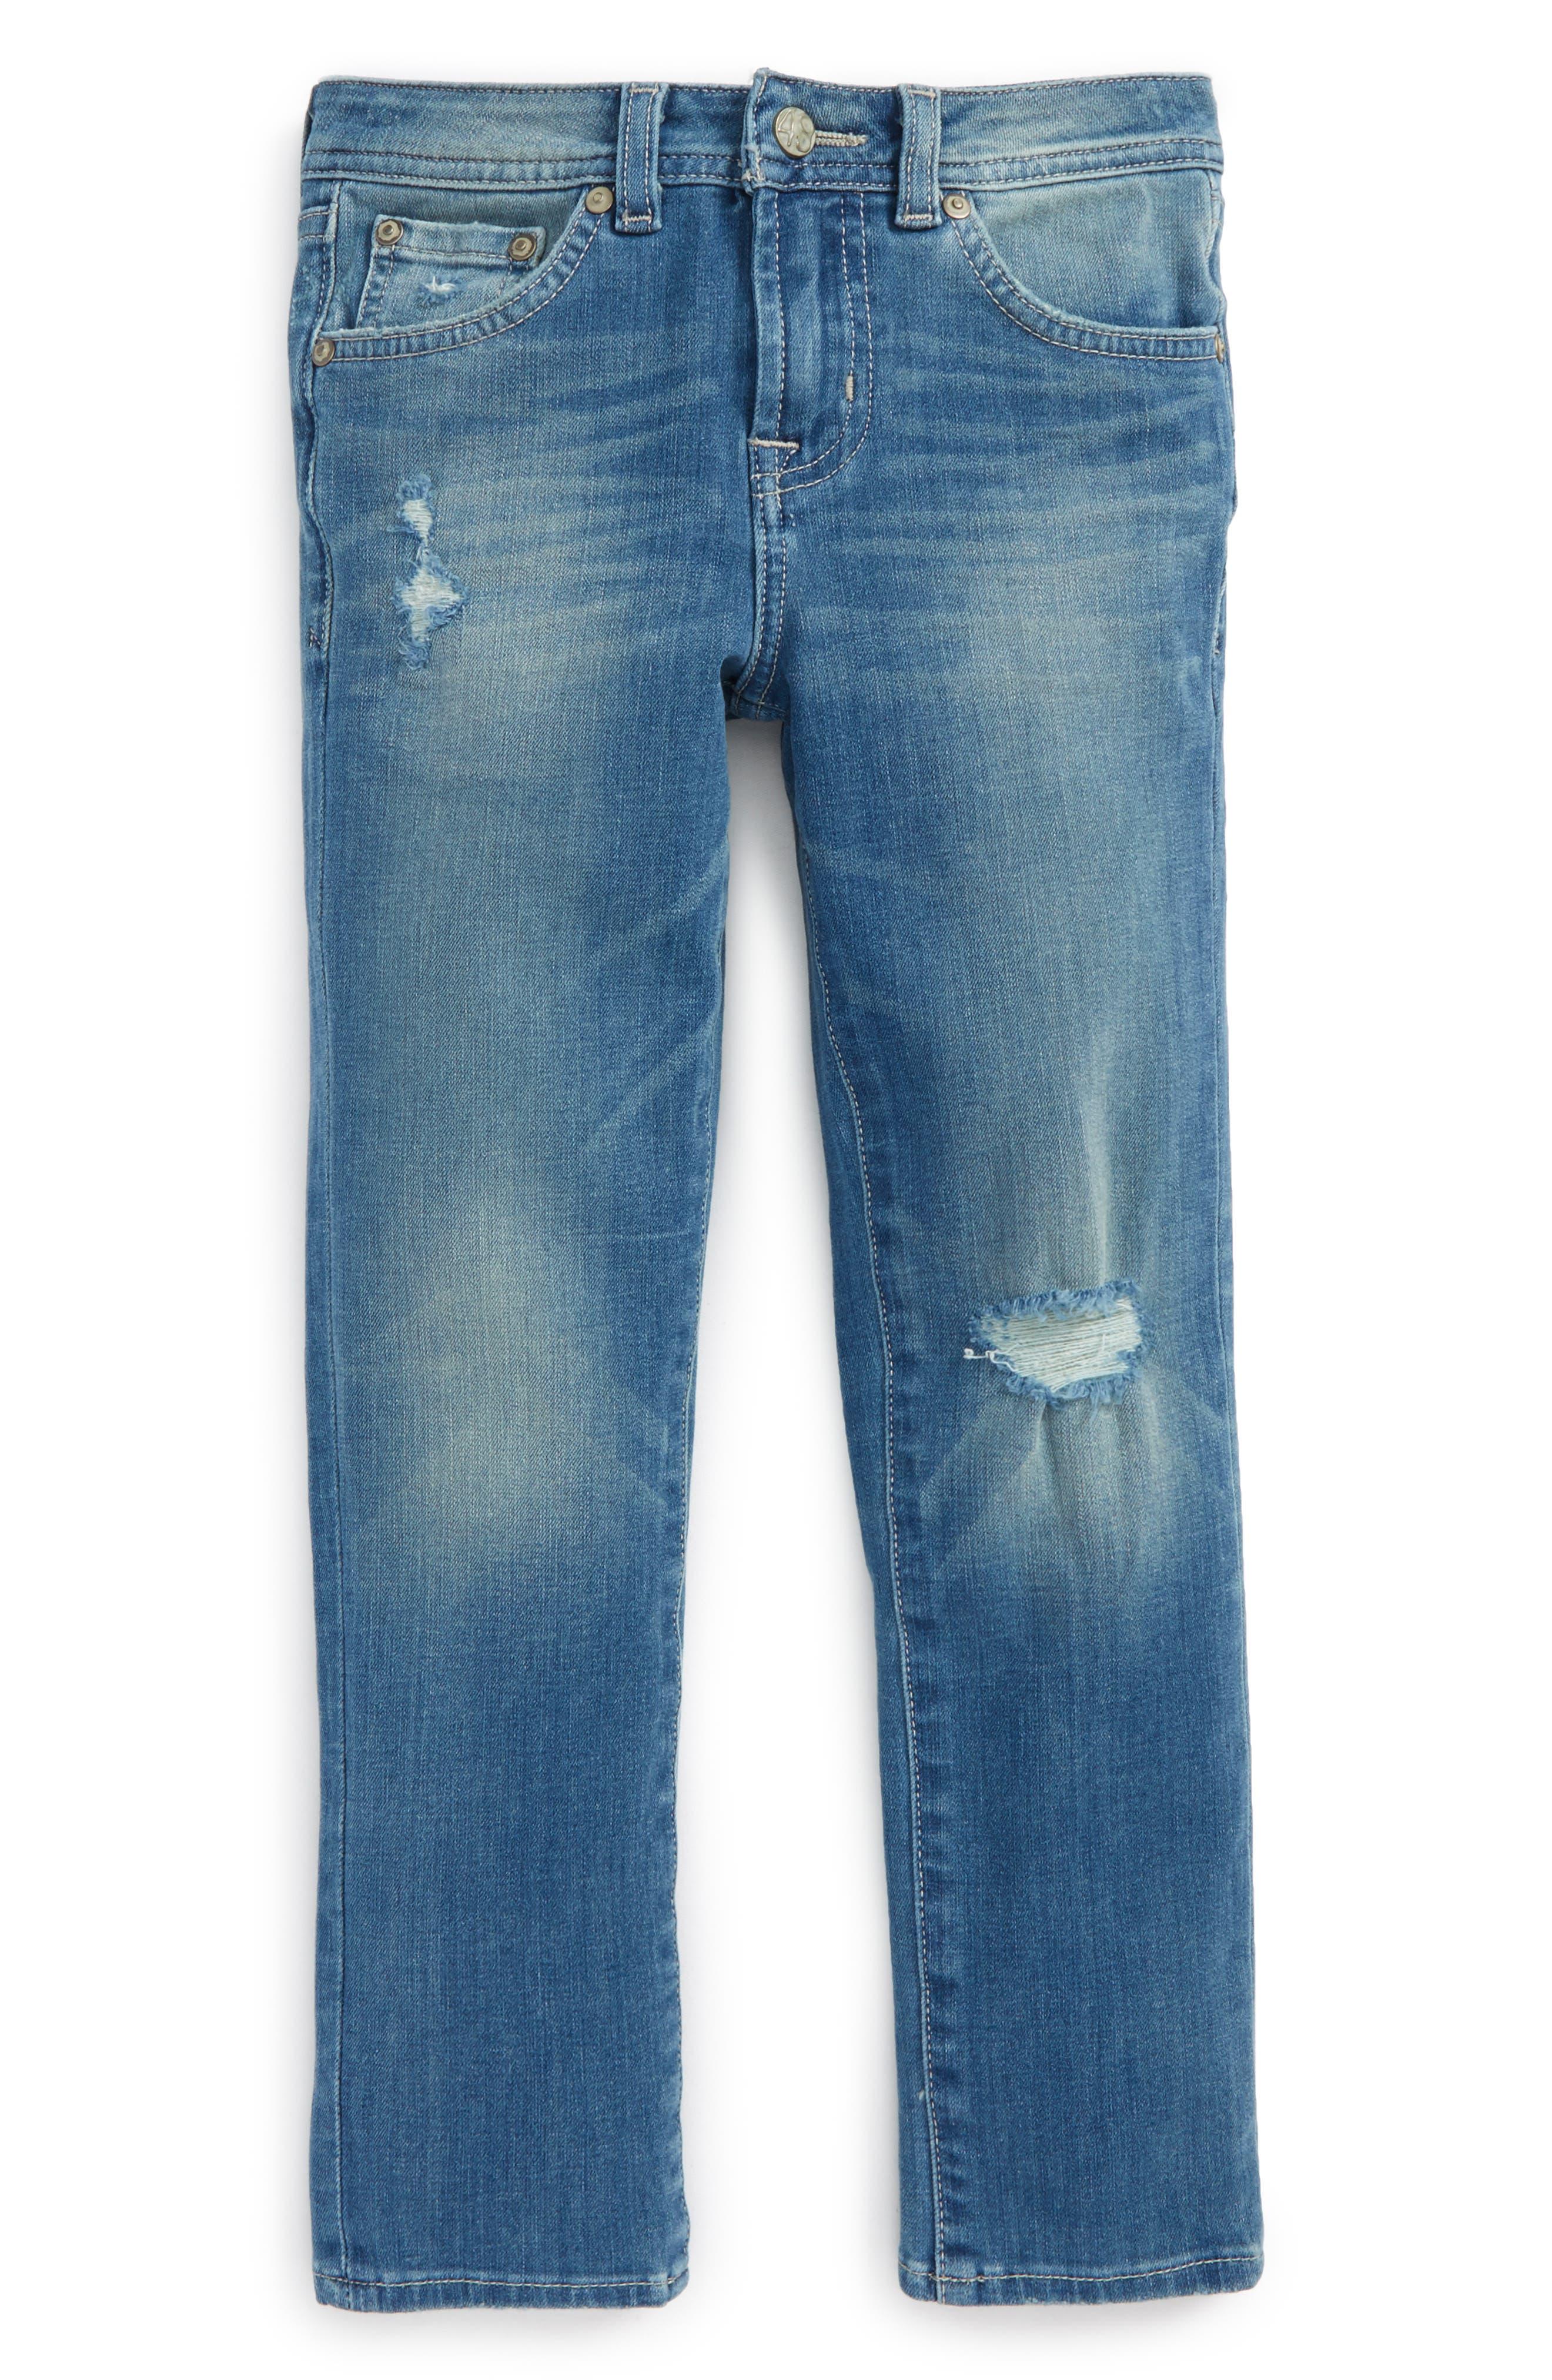 Alternate Image 1 Selected - ag adriano goldschmied kids The Noah Slim Straight Leg Jeans (Toddler Boys & Little Boys)